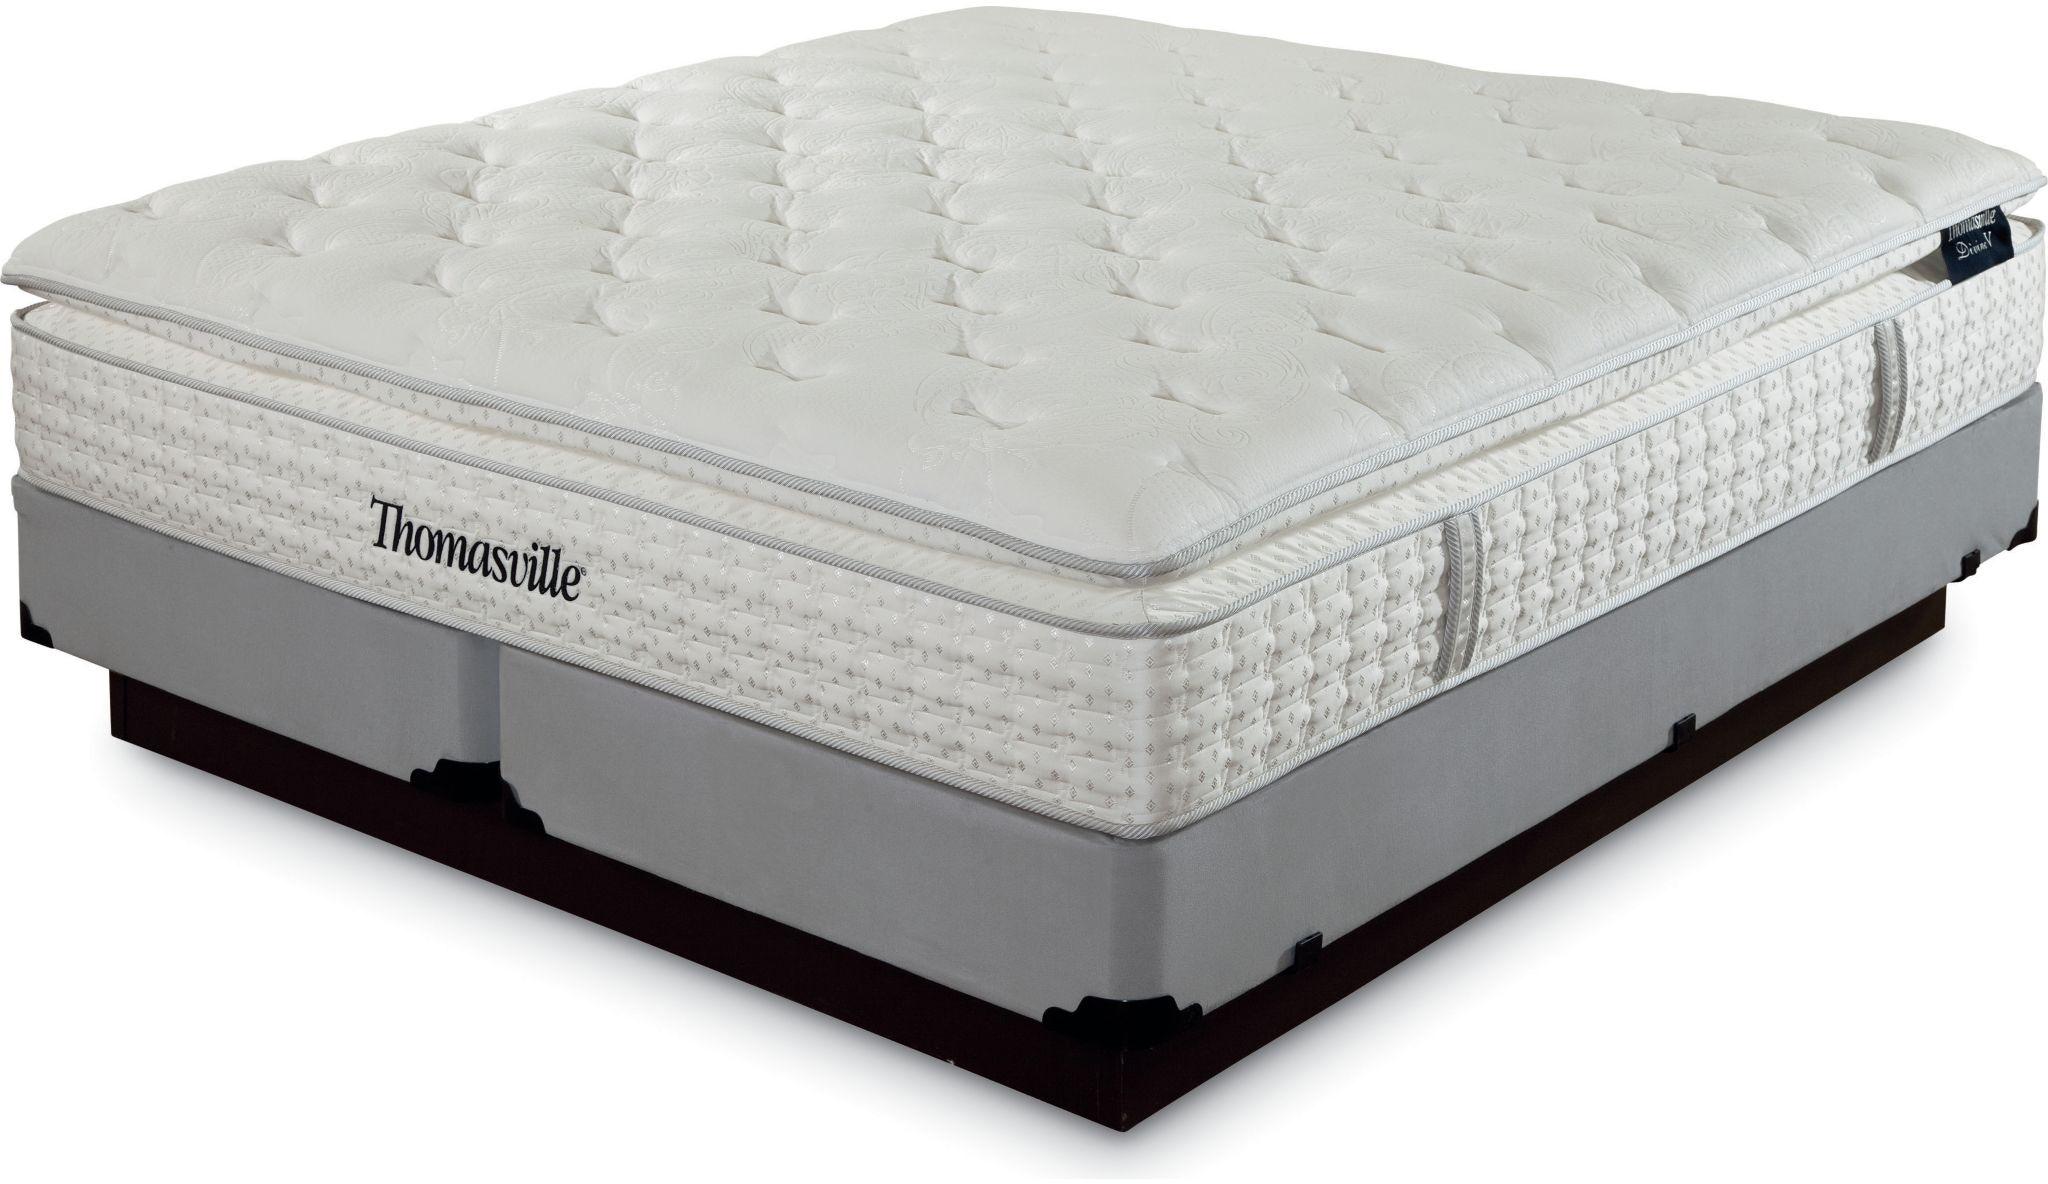 Thomasville Bedroom Full Xl Mattress Set Divine 5 59705